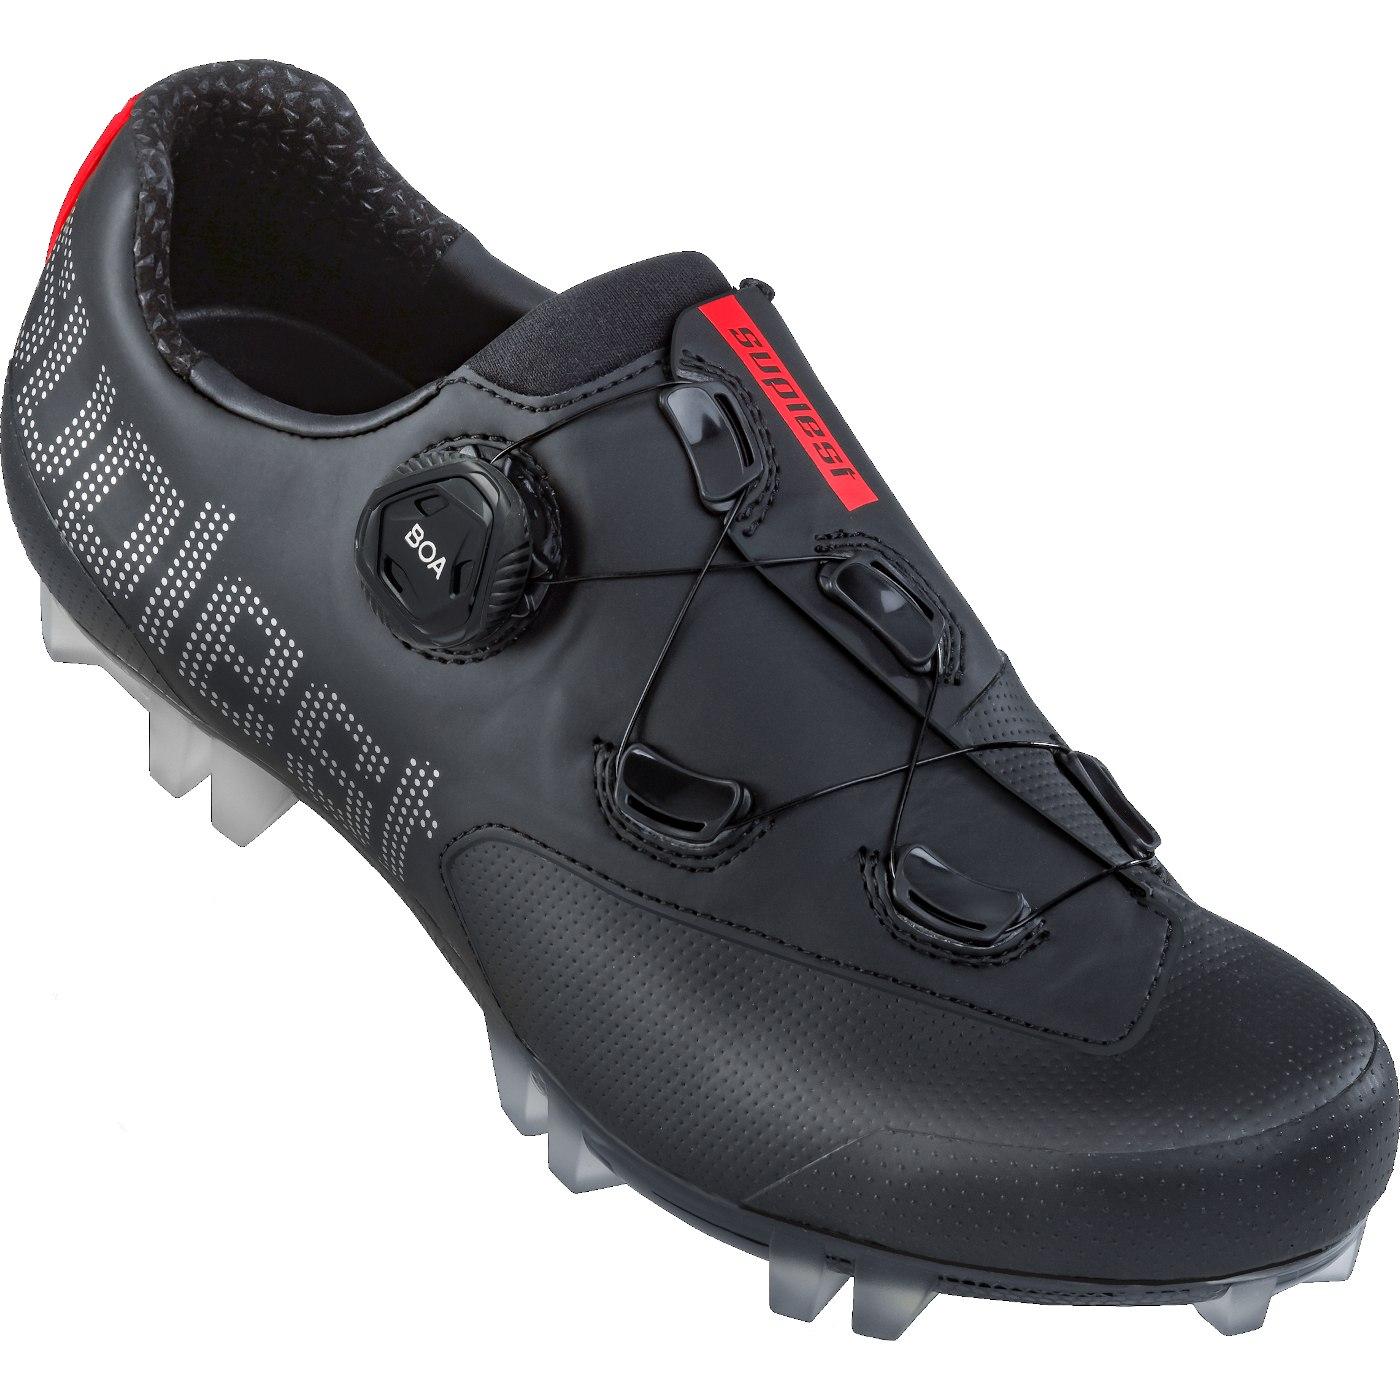 Image of Suplest EDGE+ BOA L6 Crosscountry Sport Shoe - Black / Silver 02.042.